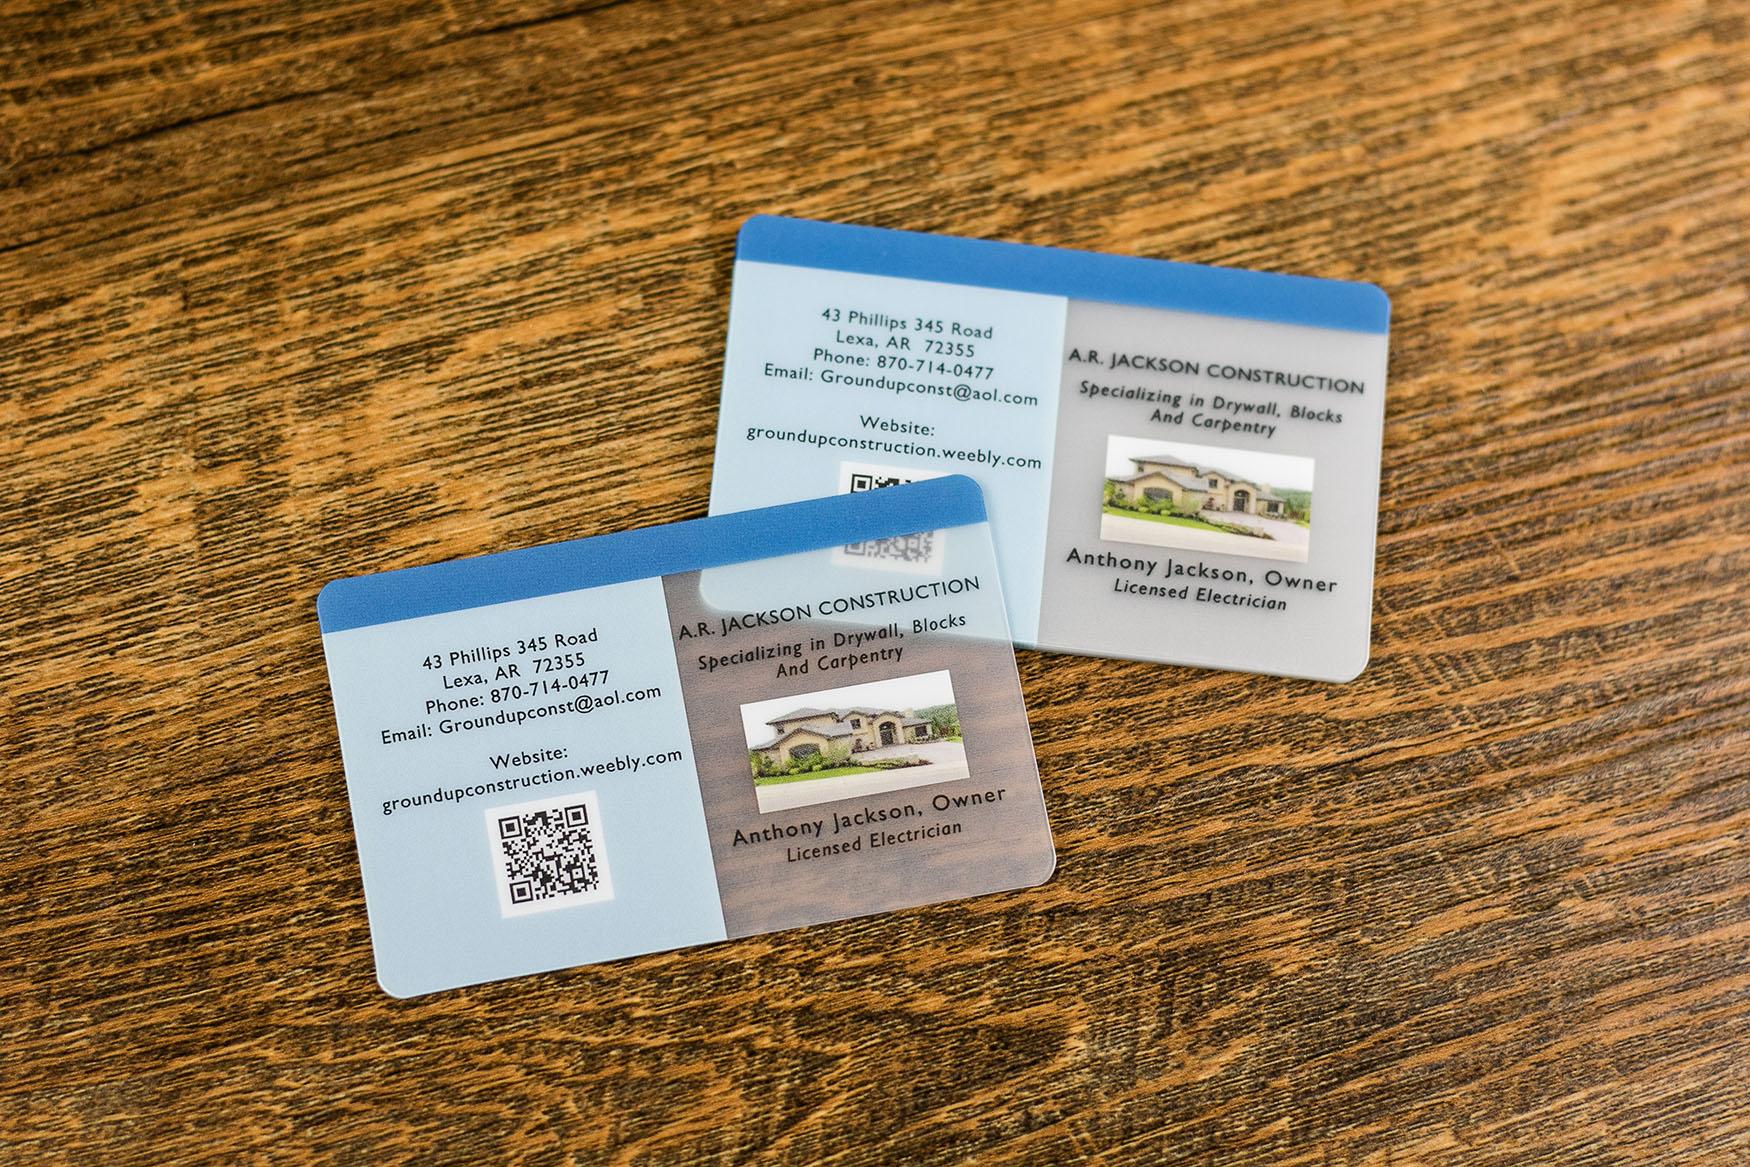 A.R. Jackson Construction Business Cards